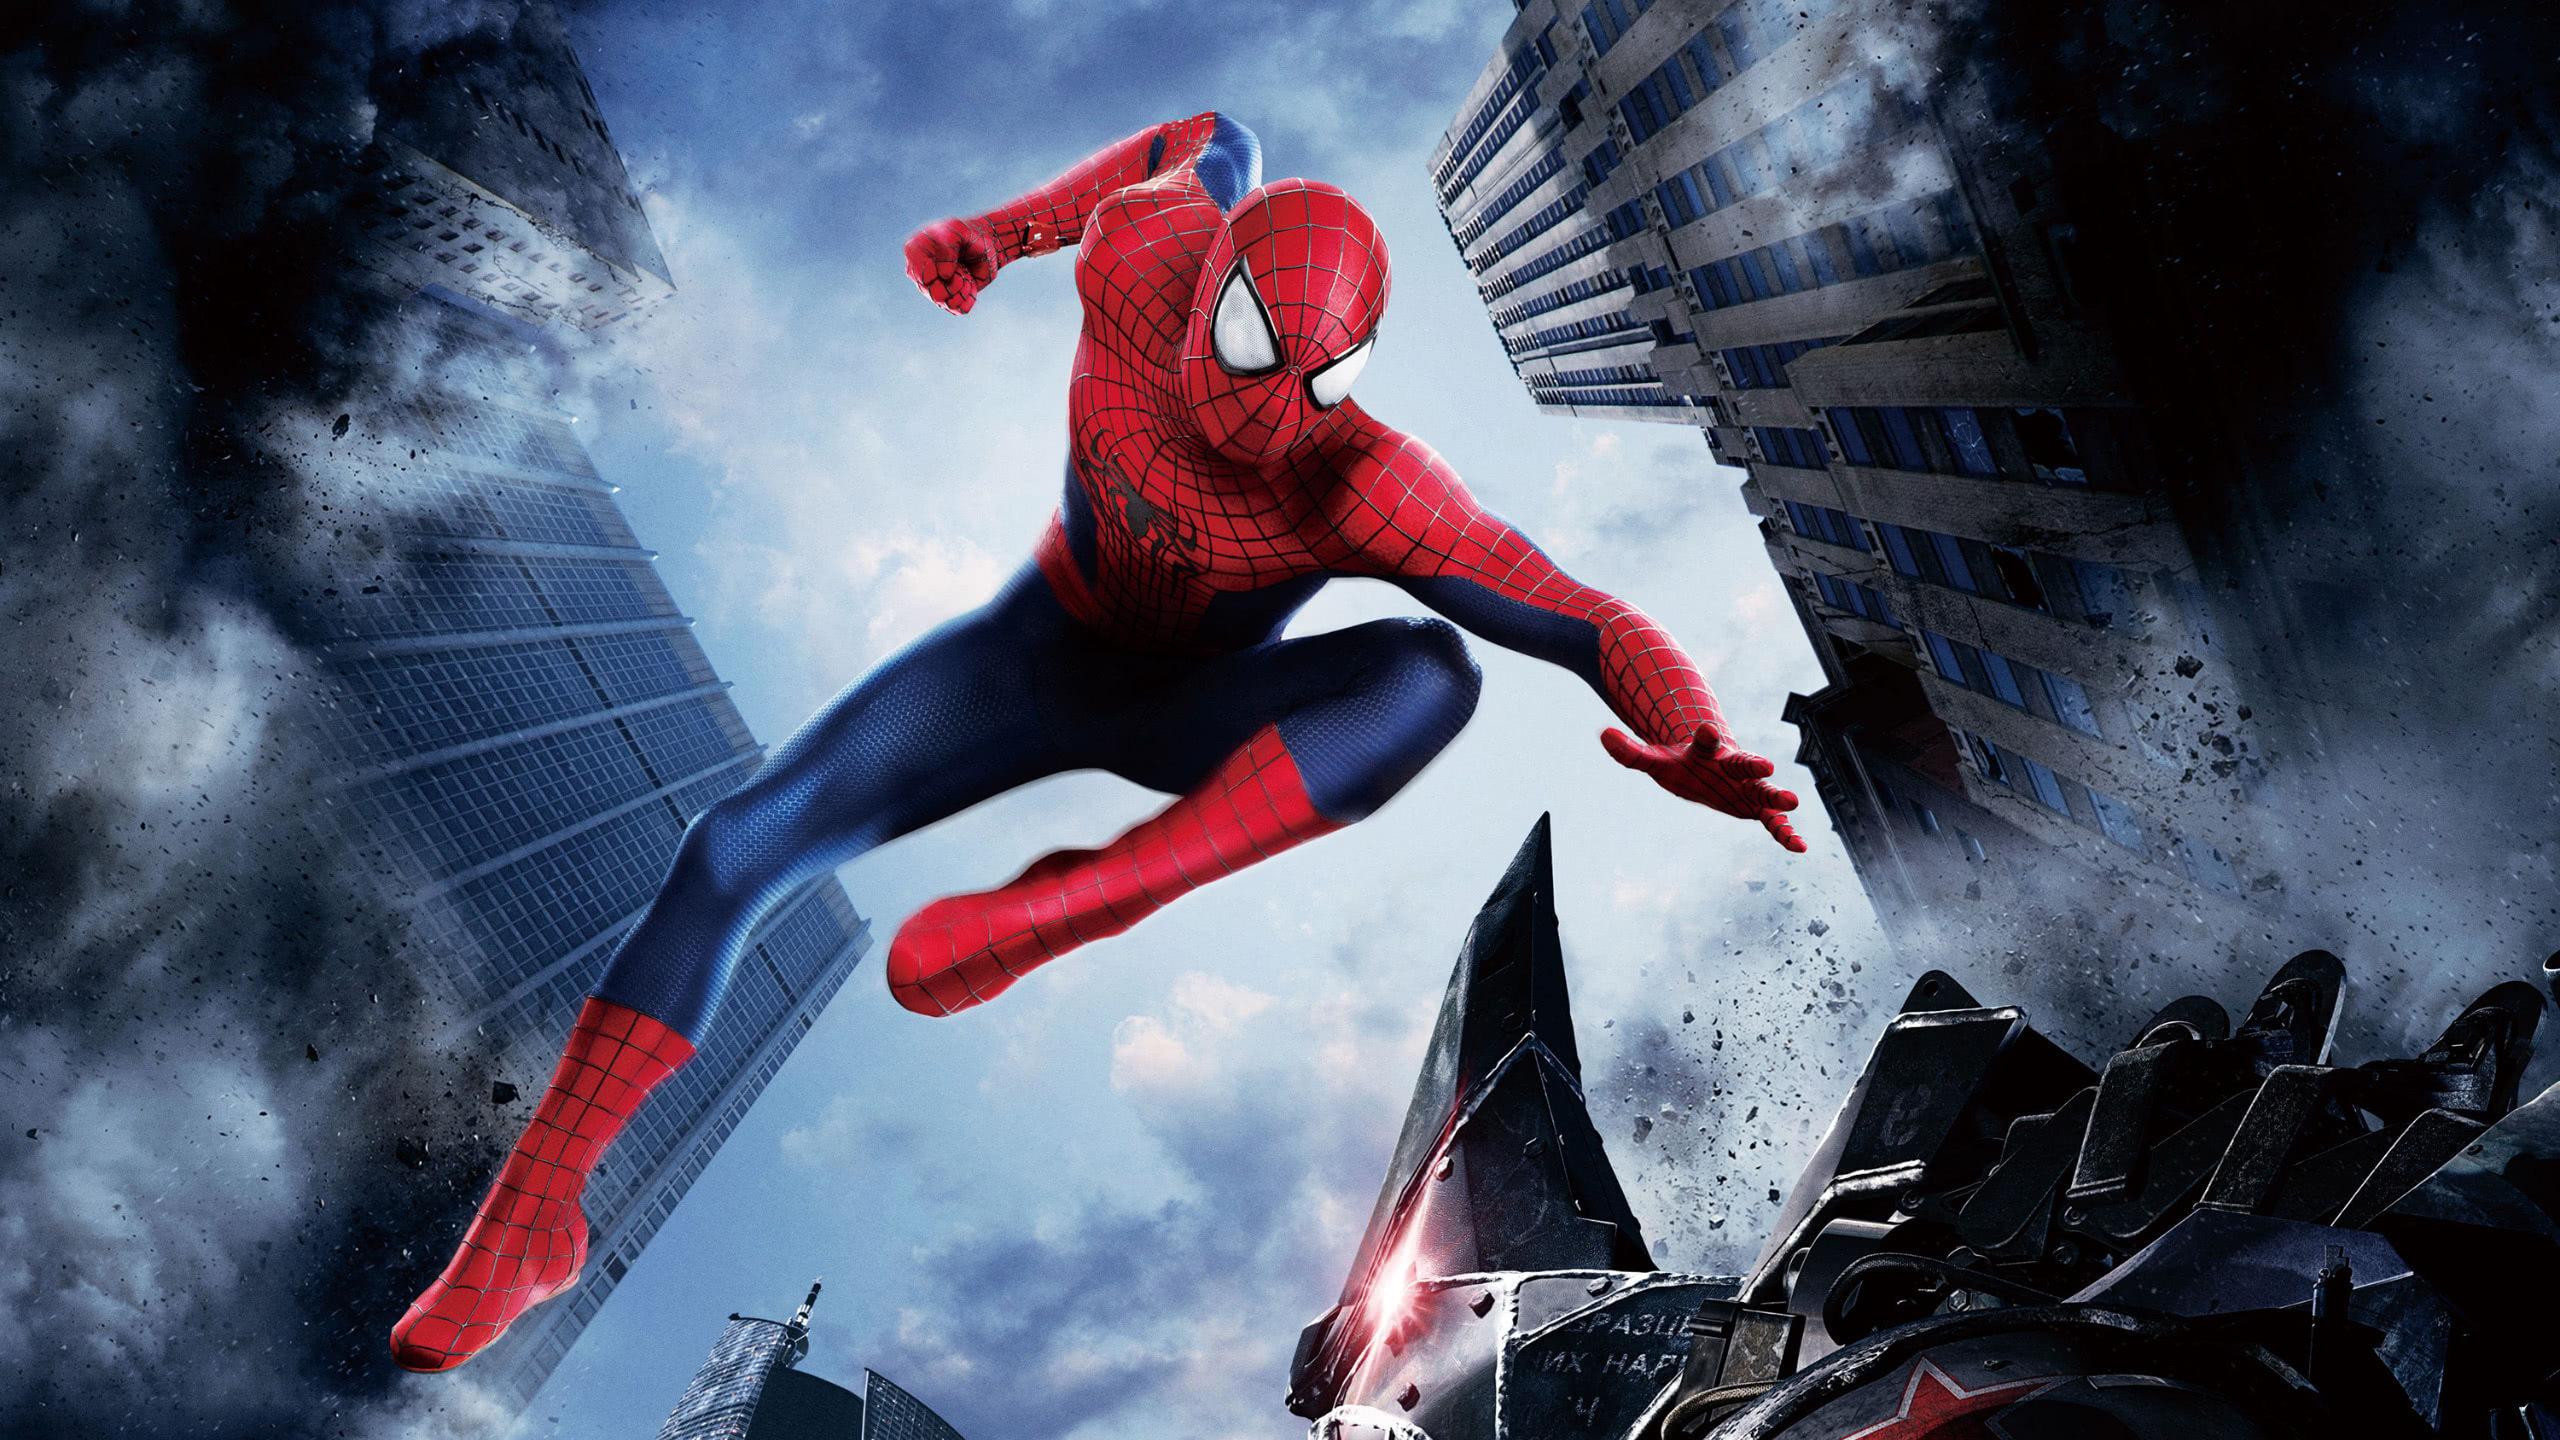 the amazing spider man wqhd 1440p wallpaper